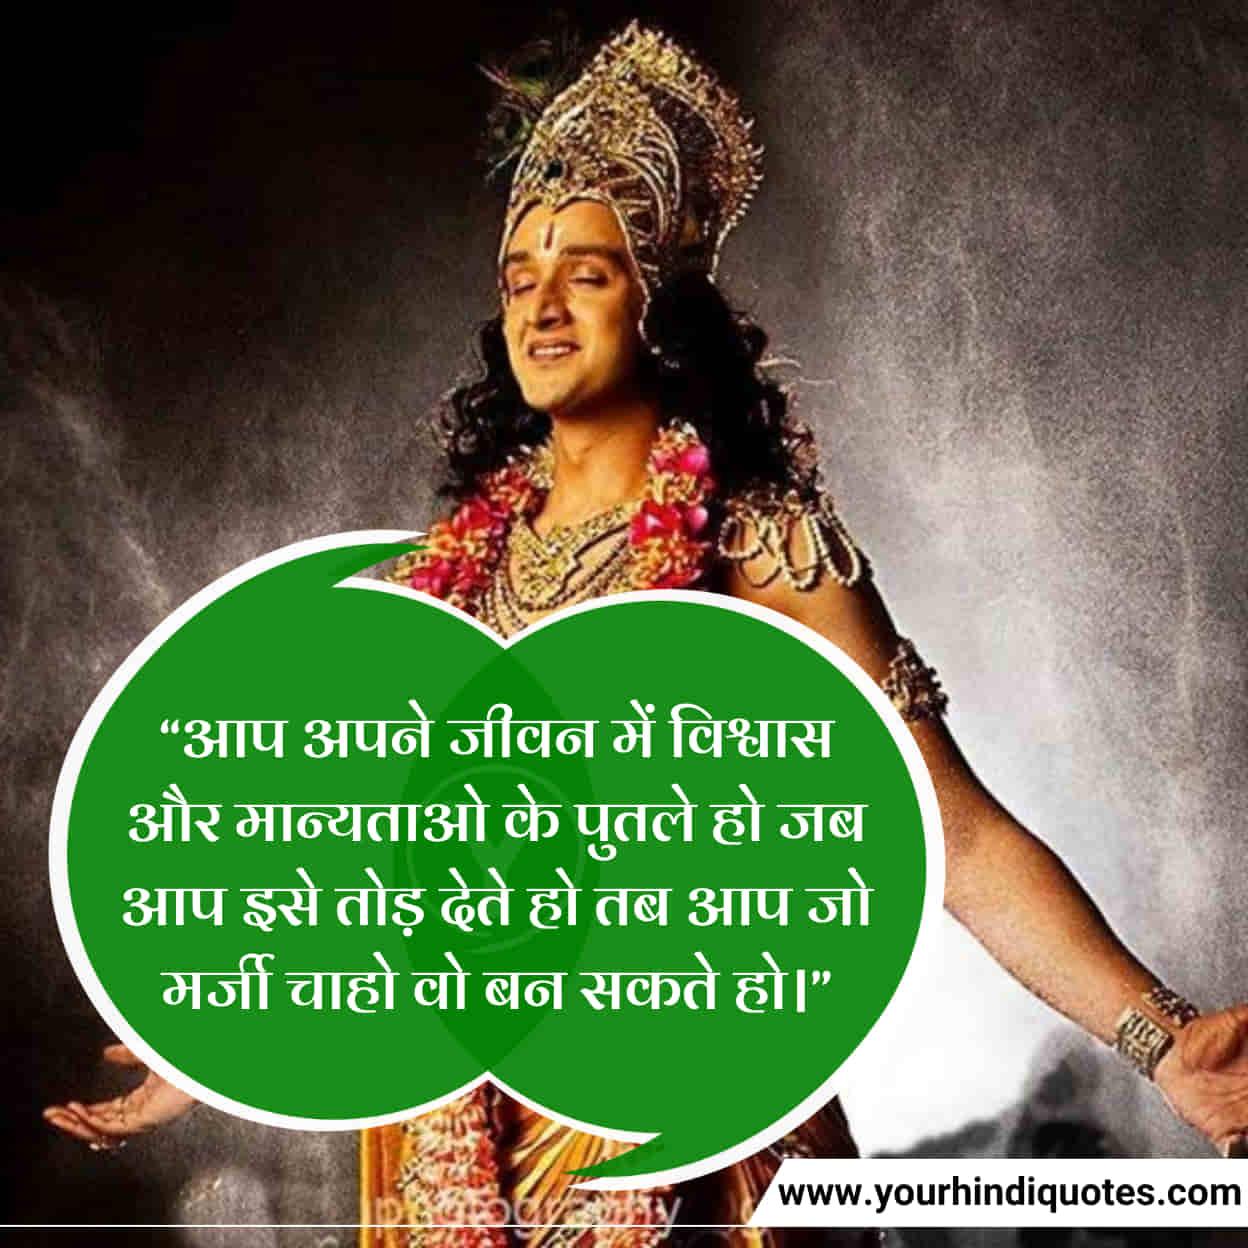 Best Bhagwat Gita Motivational Quotes In Hindi